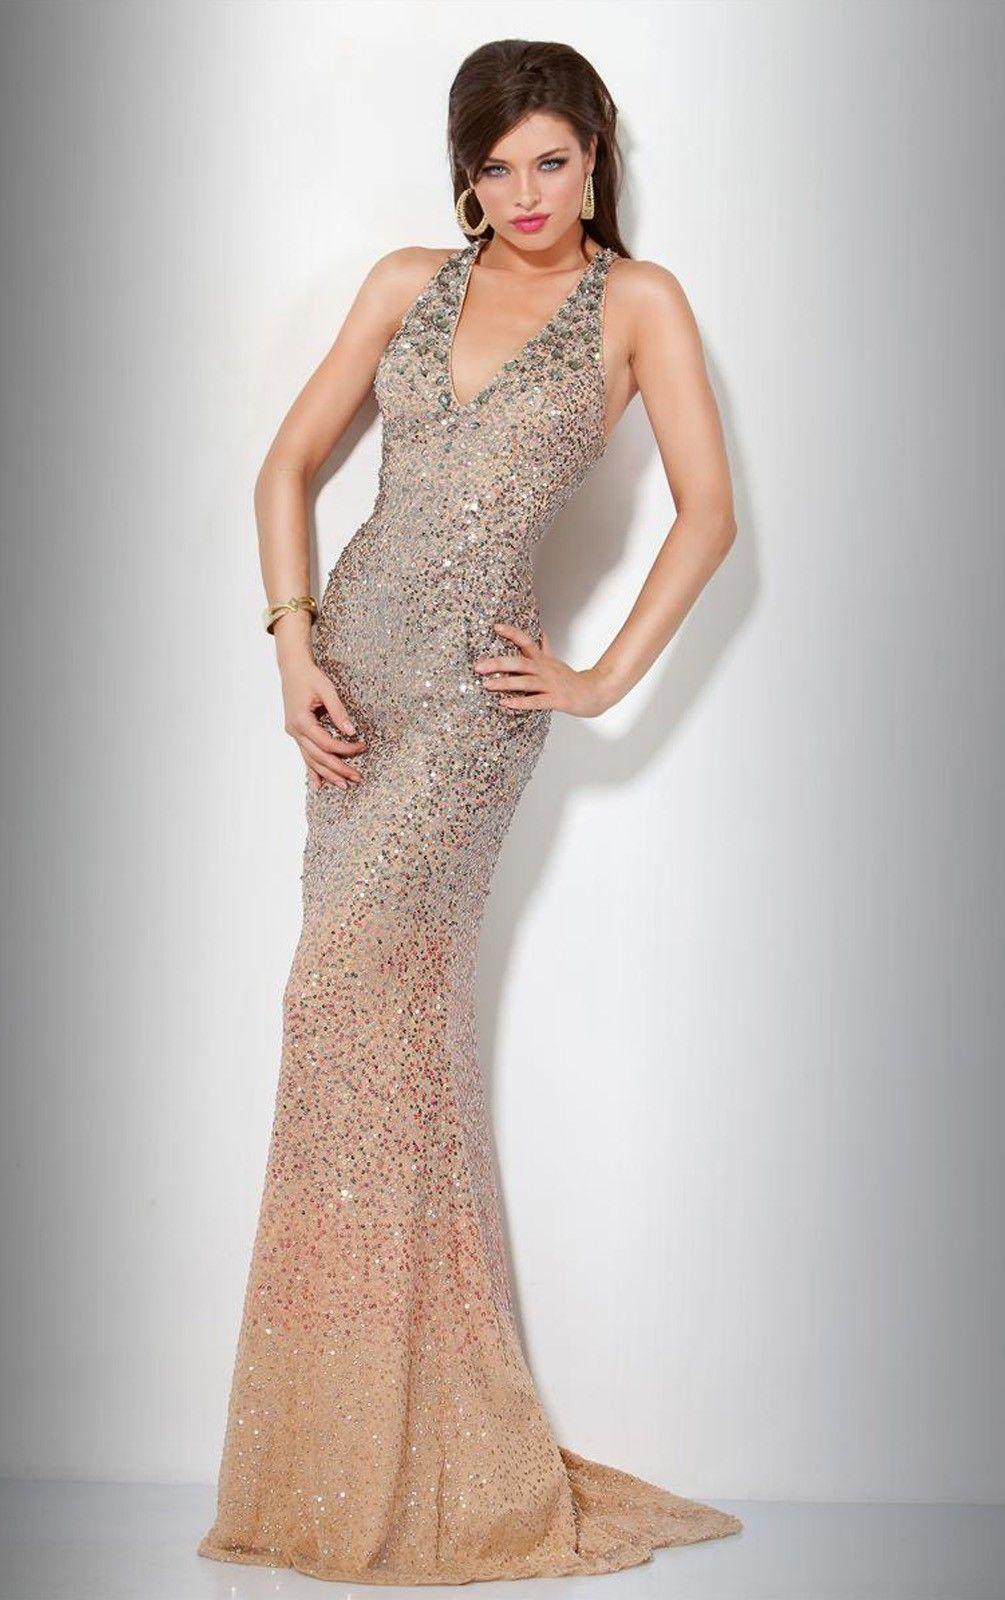 Sequined wedding dress  Symphony Vneck Trumpet Sleeveless Sequined Brush Train Prom Dresses